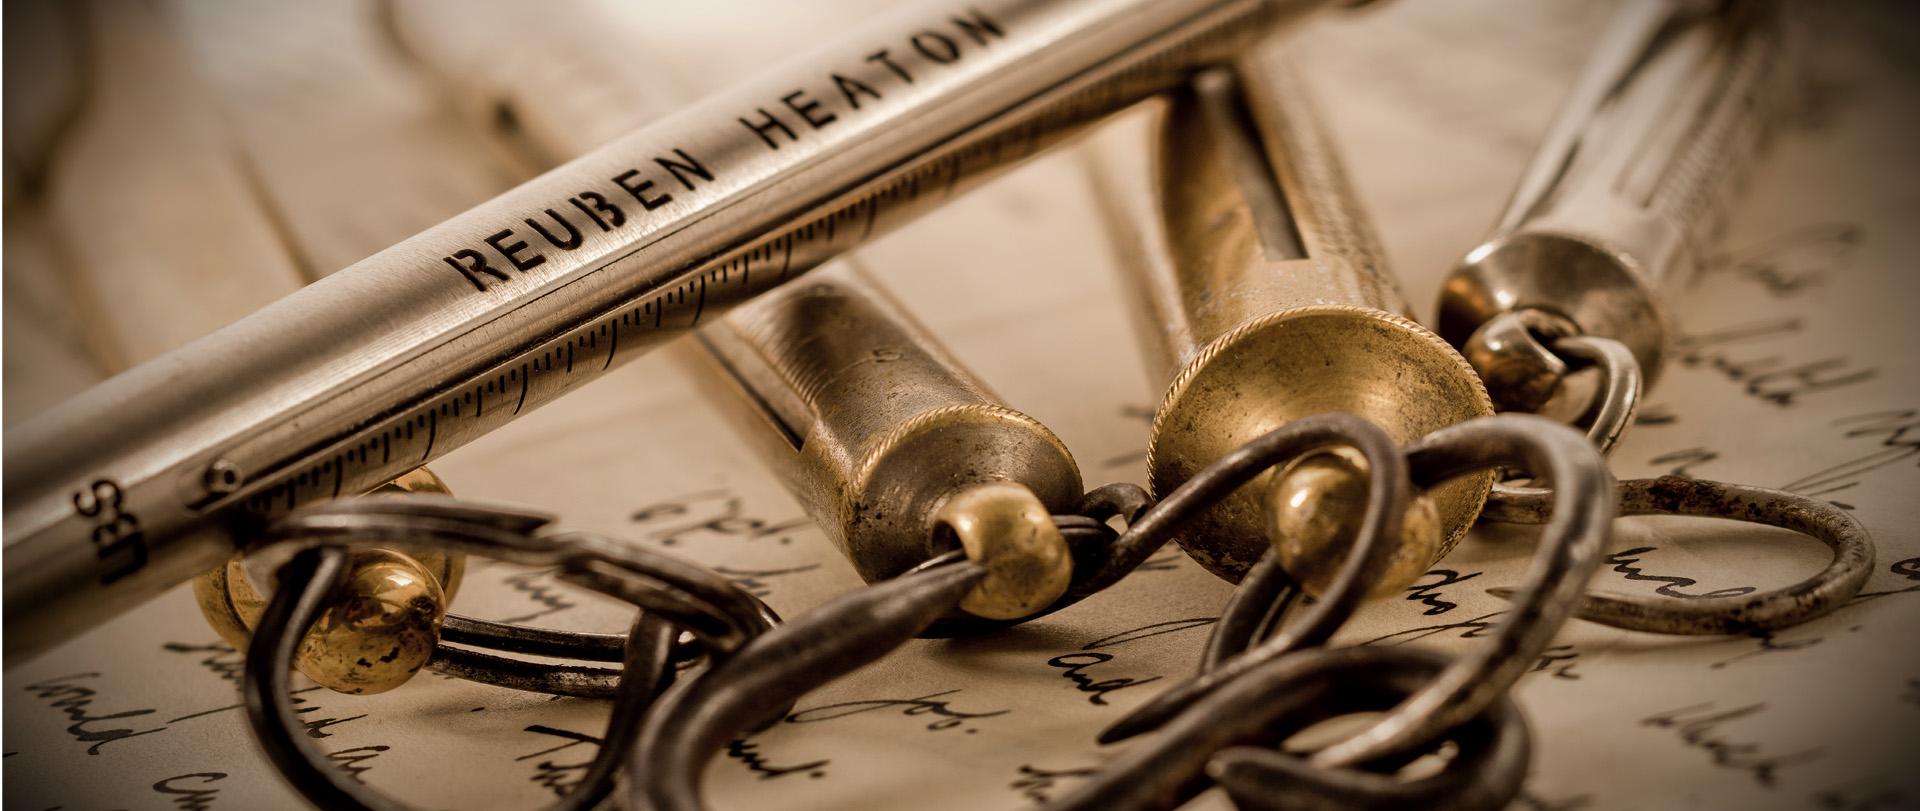 Weighing Scales Since 1857 Reuben Heaton British Manufacturer